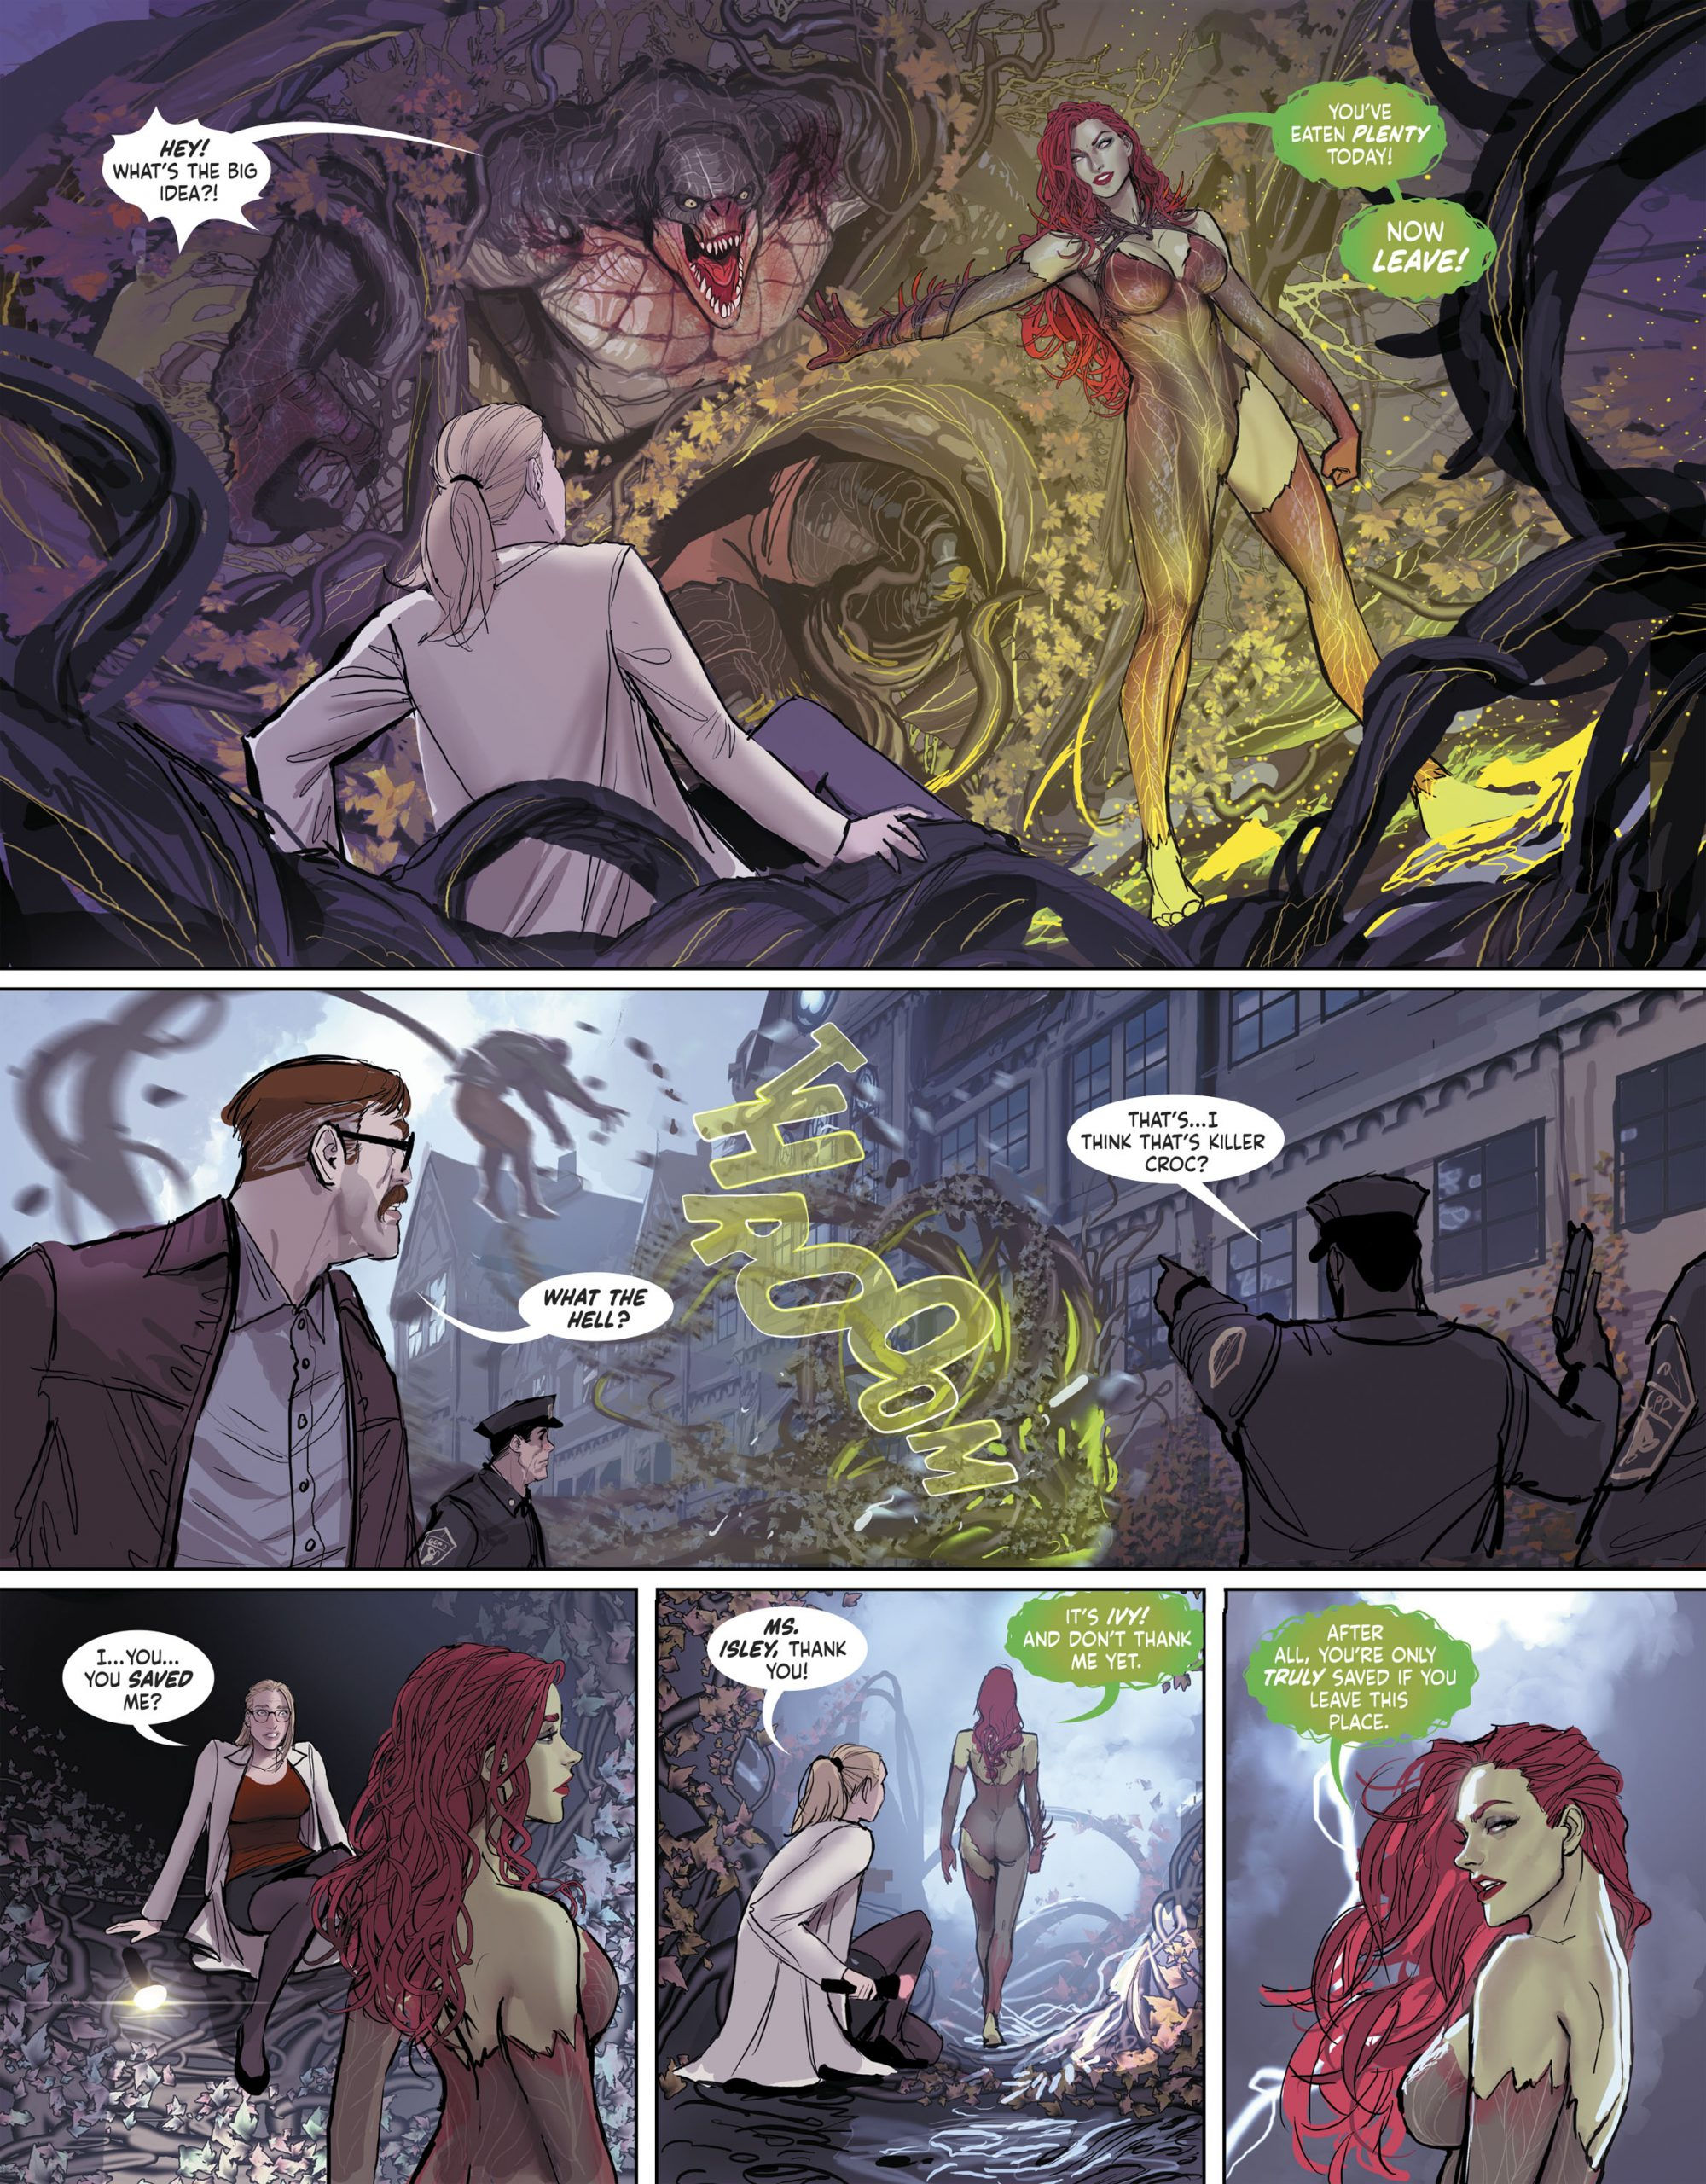 Poison Ivy saving Harleen in Arkham.